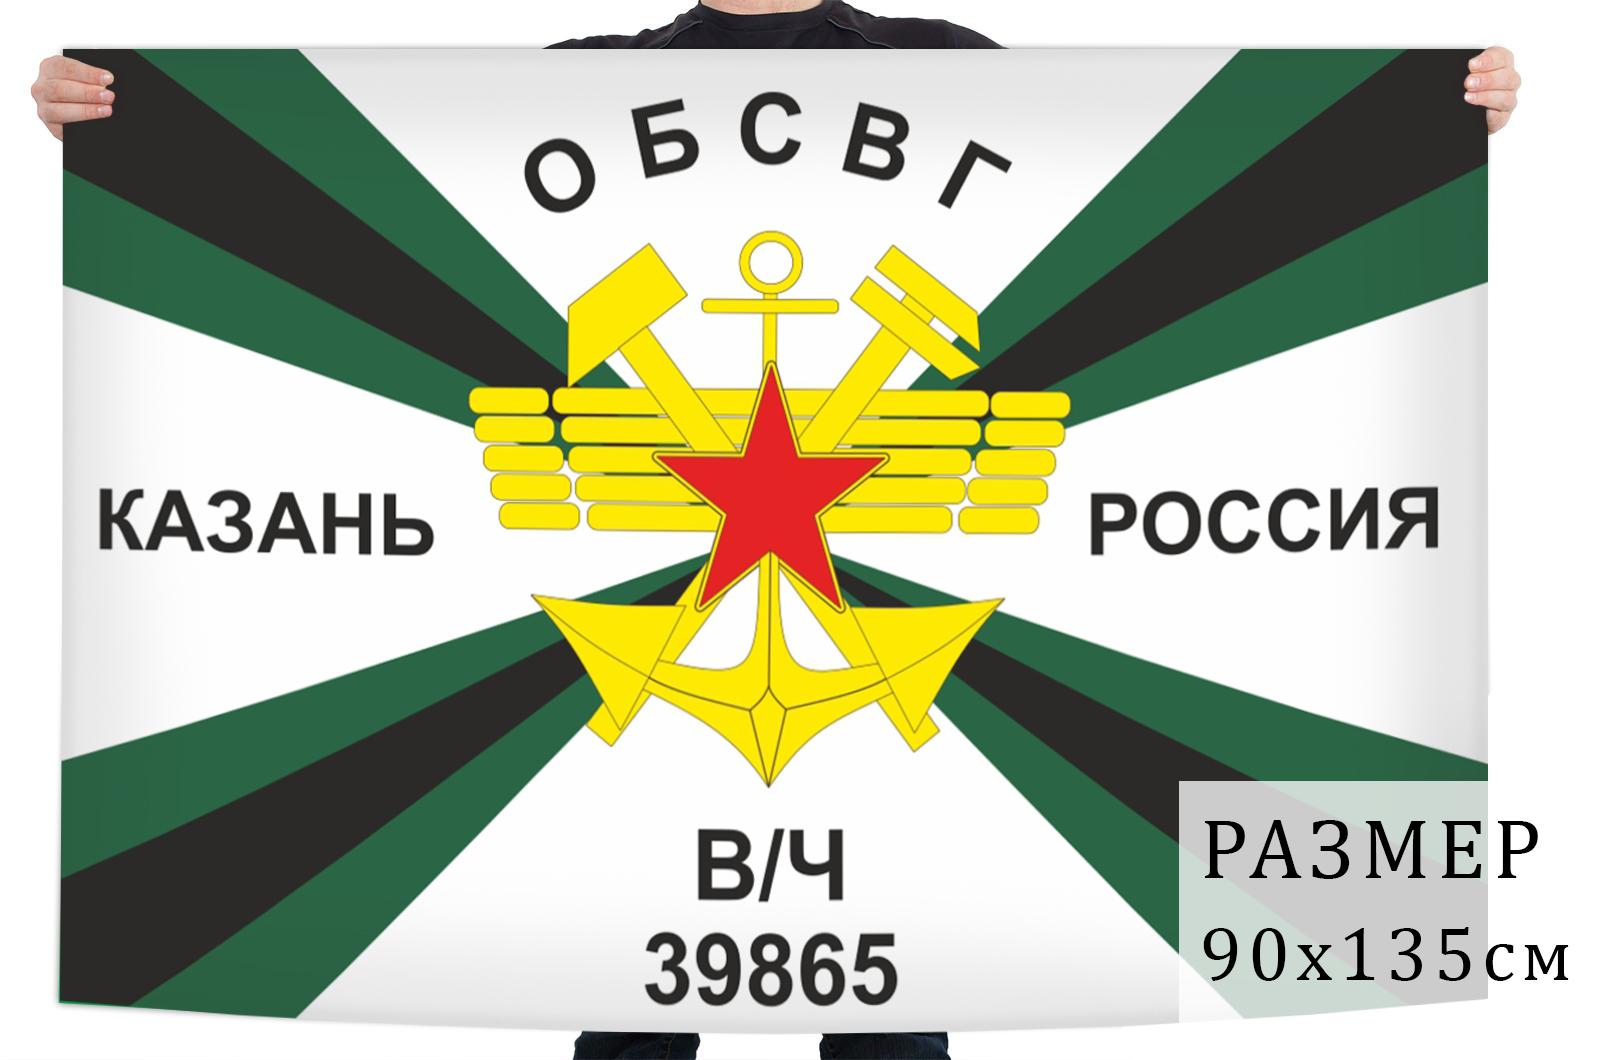 Флаг ОБСВГ Казань Россия в/ч 39865